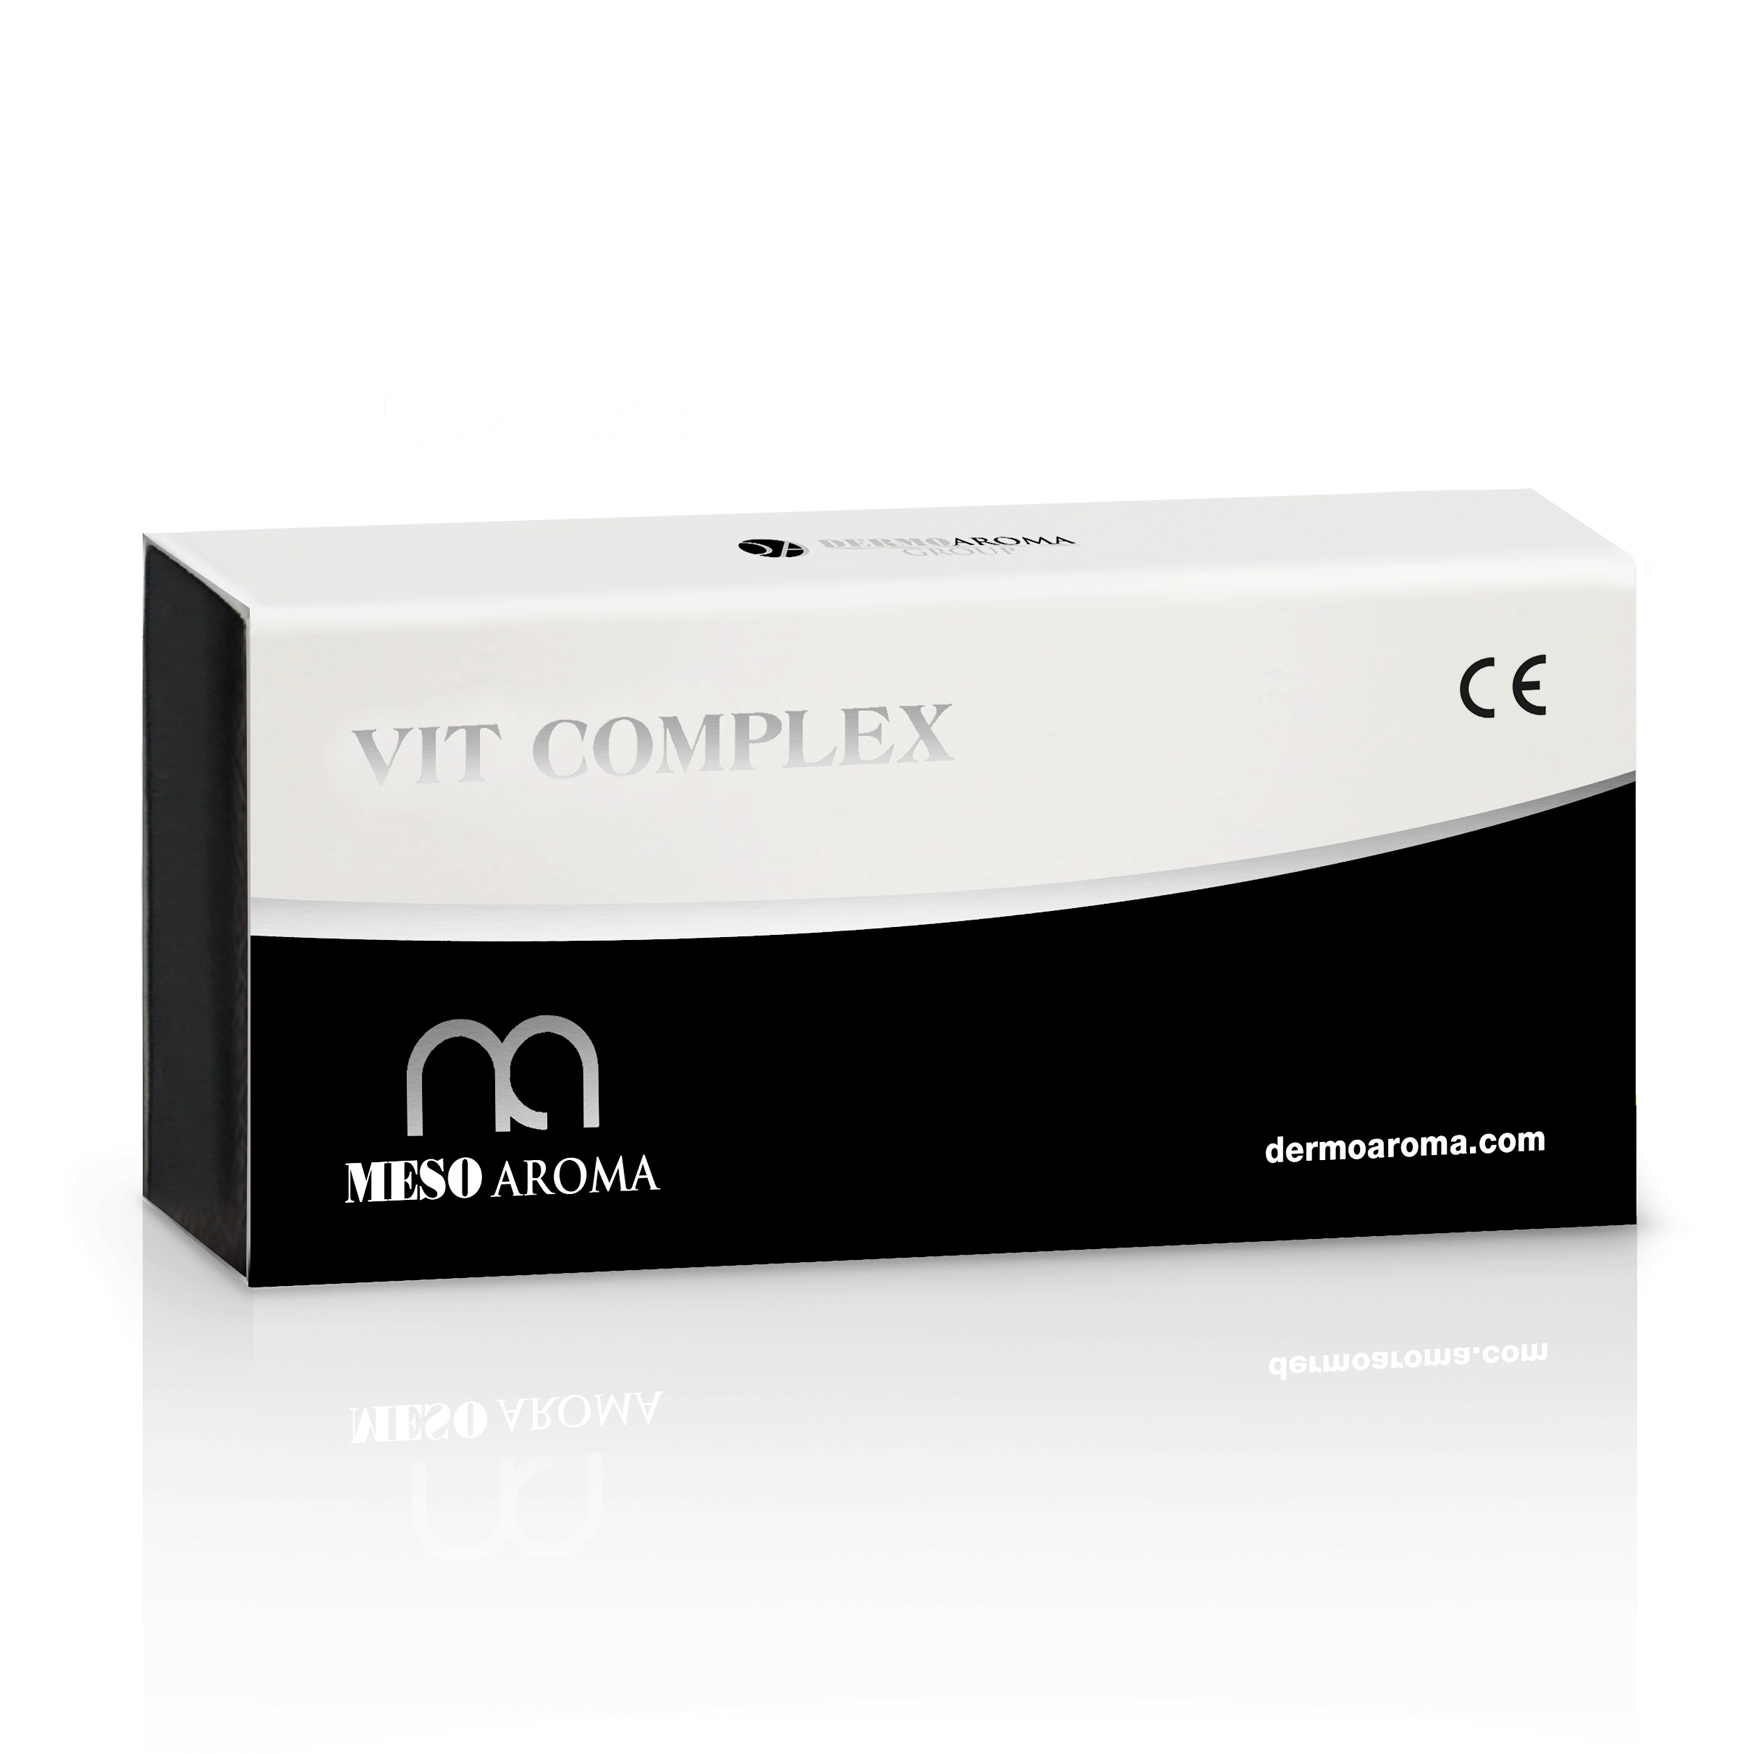 Mesoaroma-ampułka-VIT-COMPLEX-ce